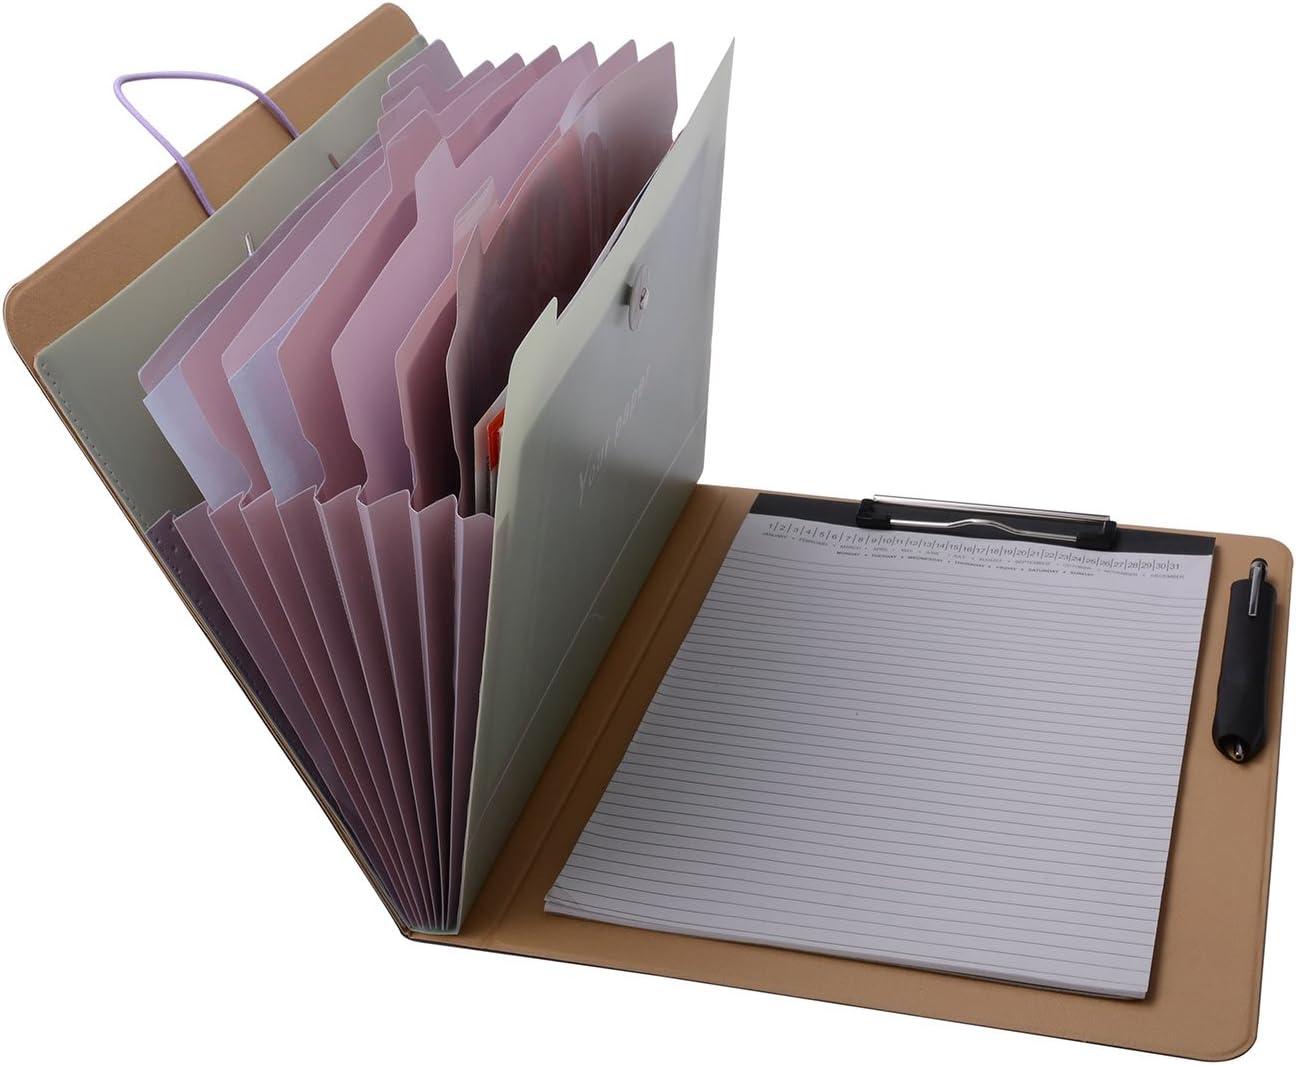 Notepad Portfolio with Expanding Files Folder, A4 Expandable File Organizer Business File Organizer Portfolio Case